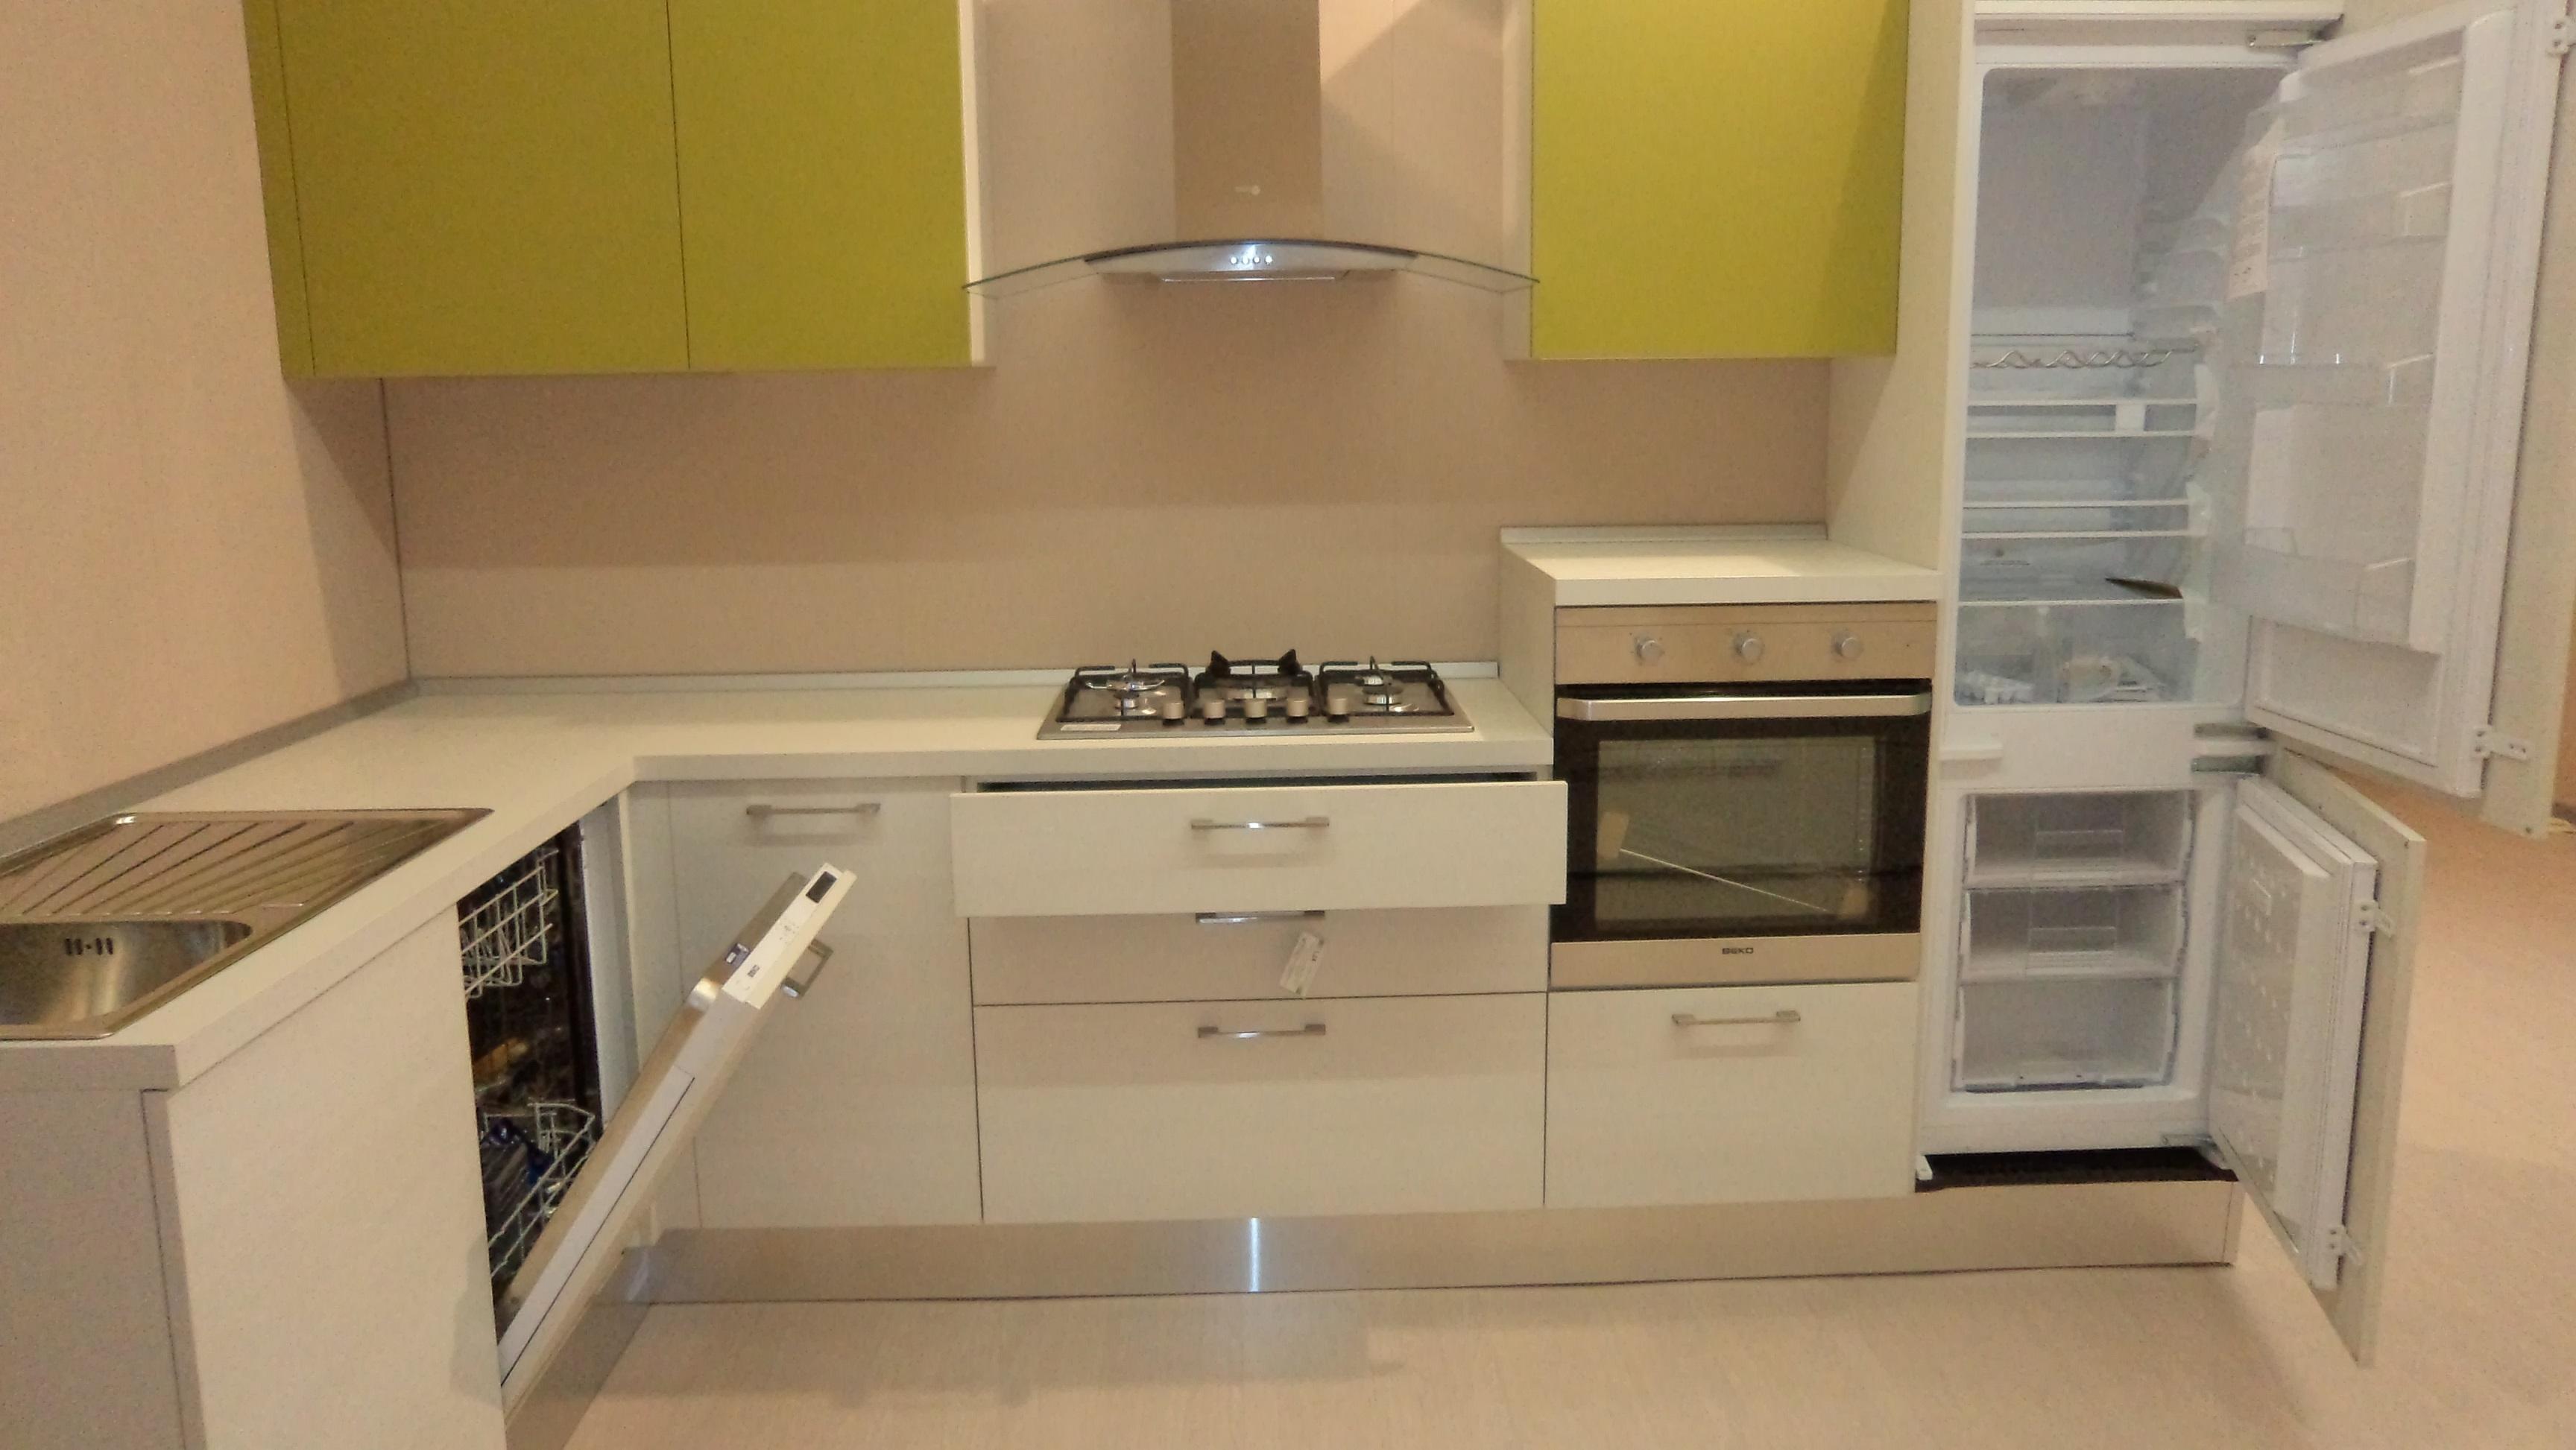 Cucina 3 Metri Angolare CP62 » Regardsdefemmes